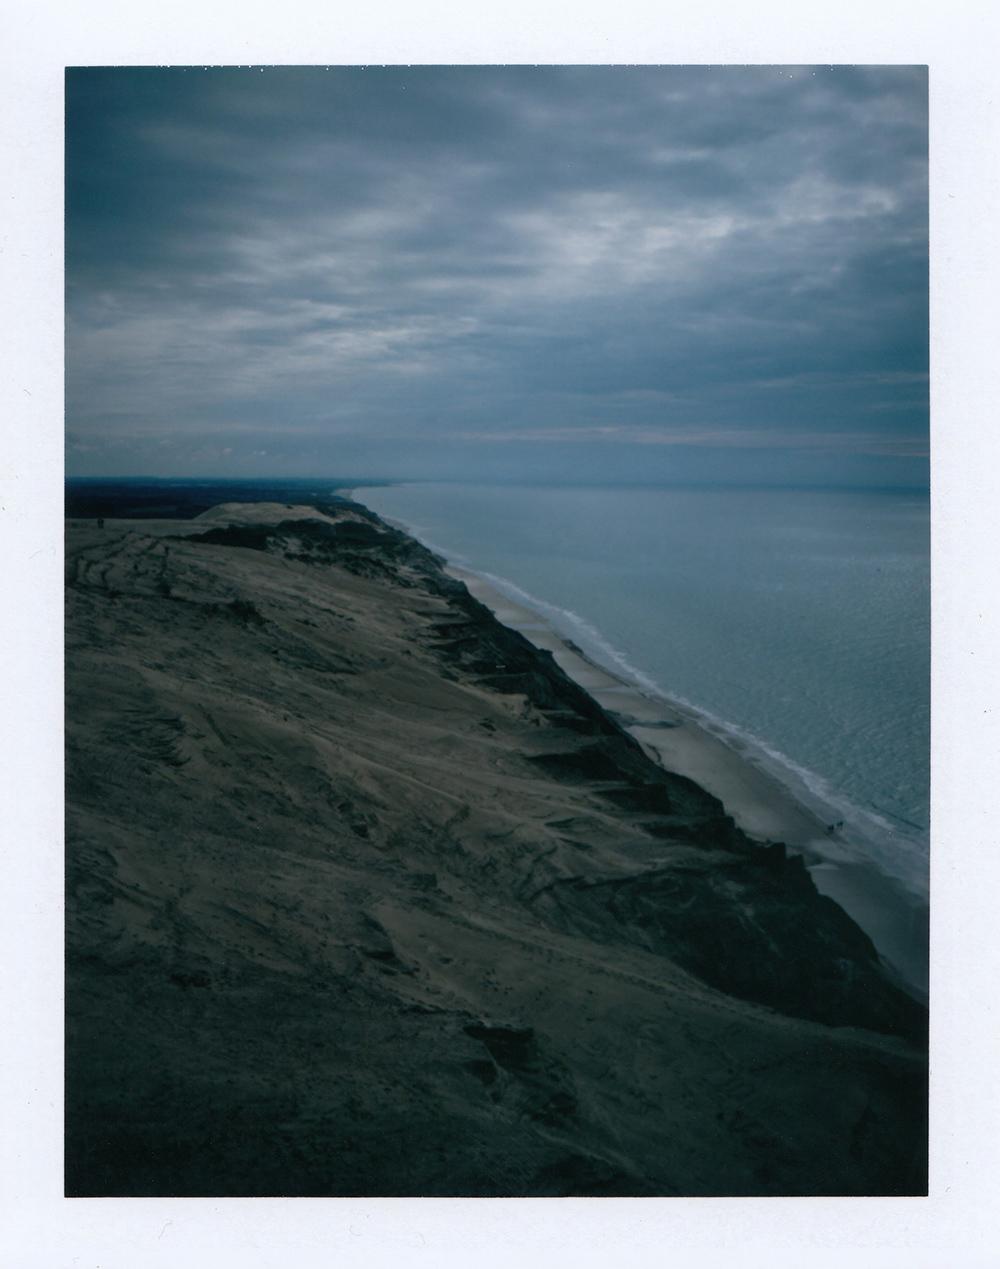 Lighthouse with a View | Polaroid Land 350 | FP-100C | Ioana Tăut